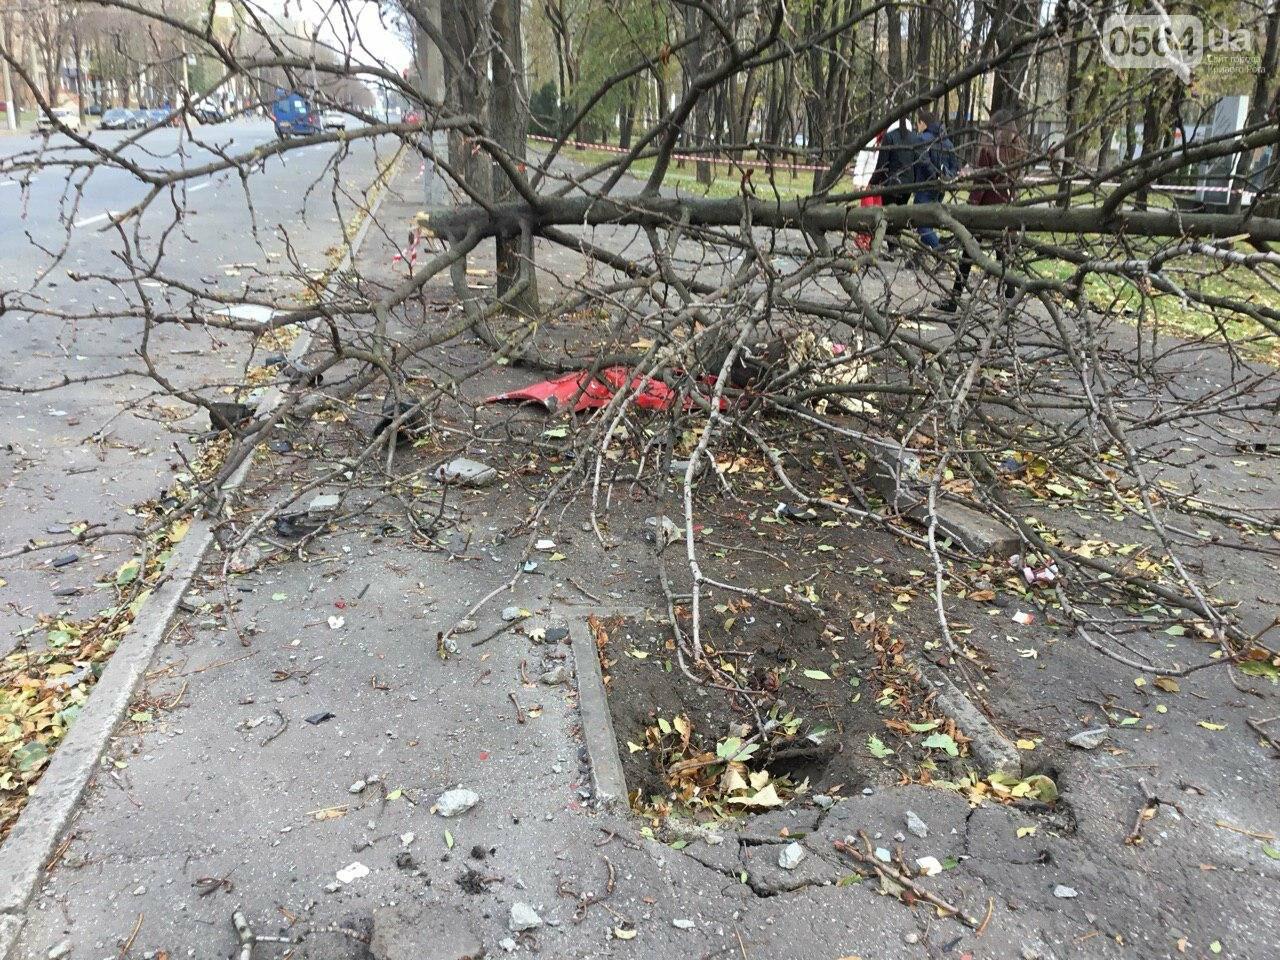 Куски стекла и обшивки разбившейся в Кривом Роге иномарки разлетелись на десятки метров, - ФОТО, фото-21